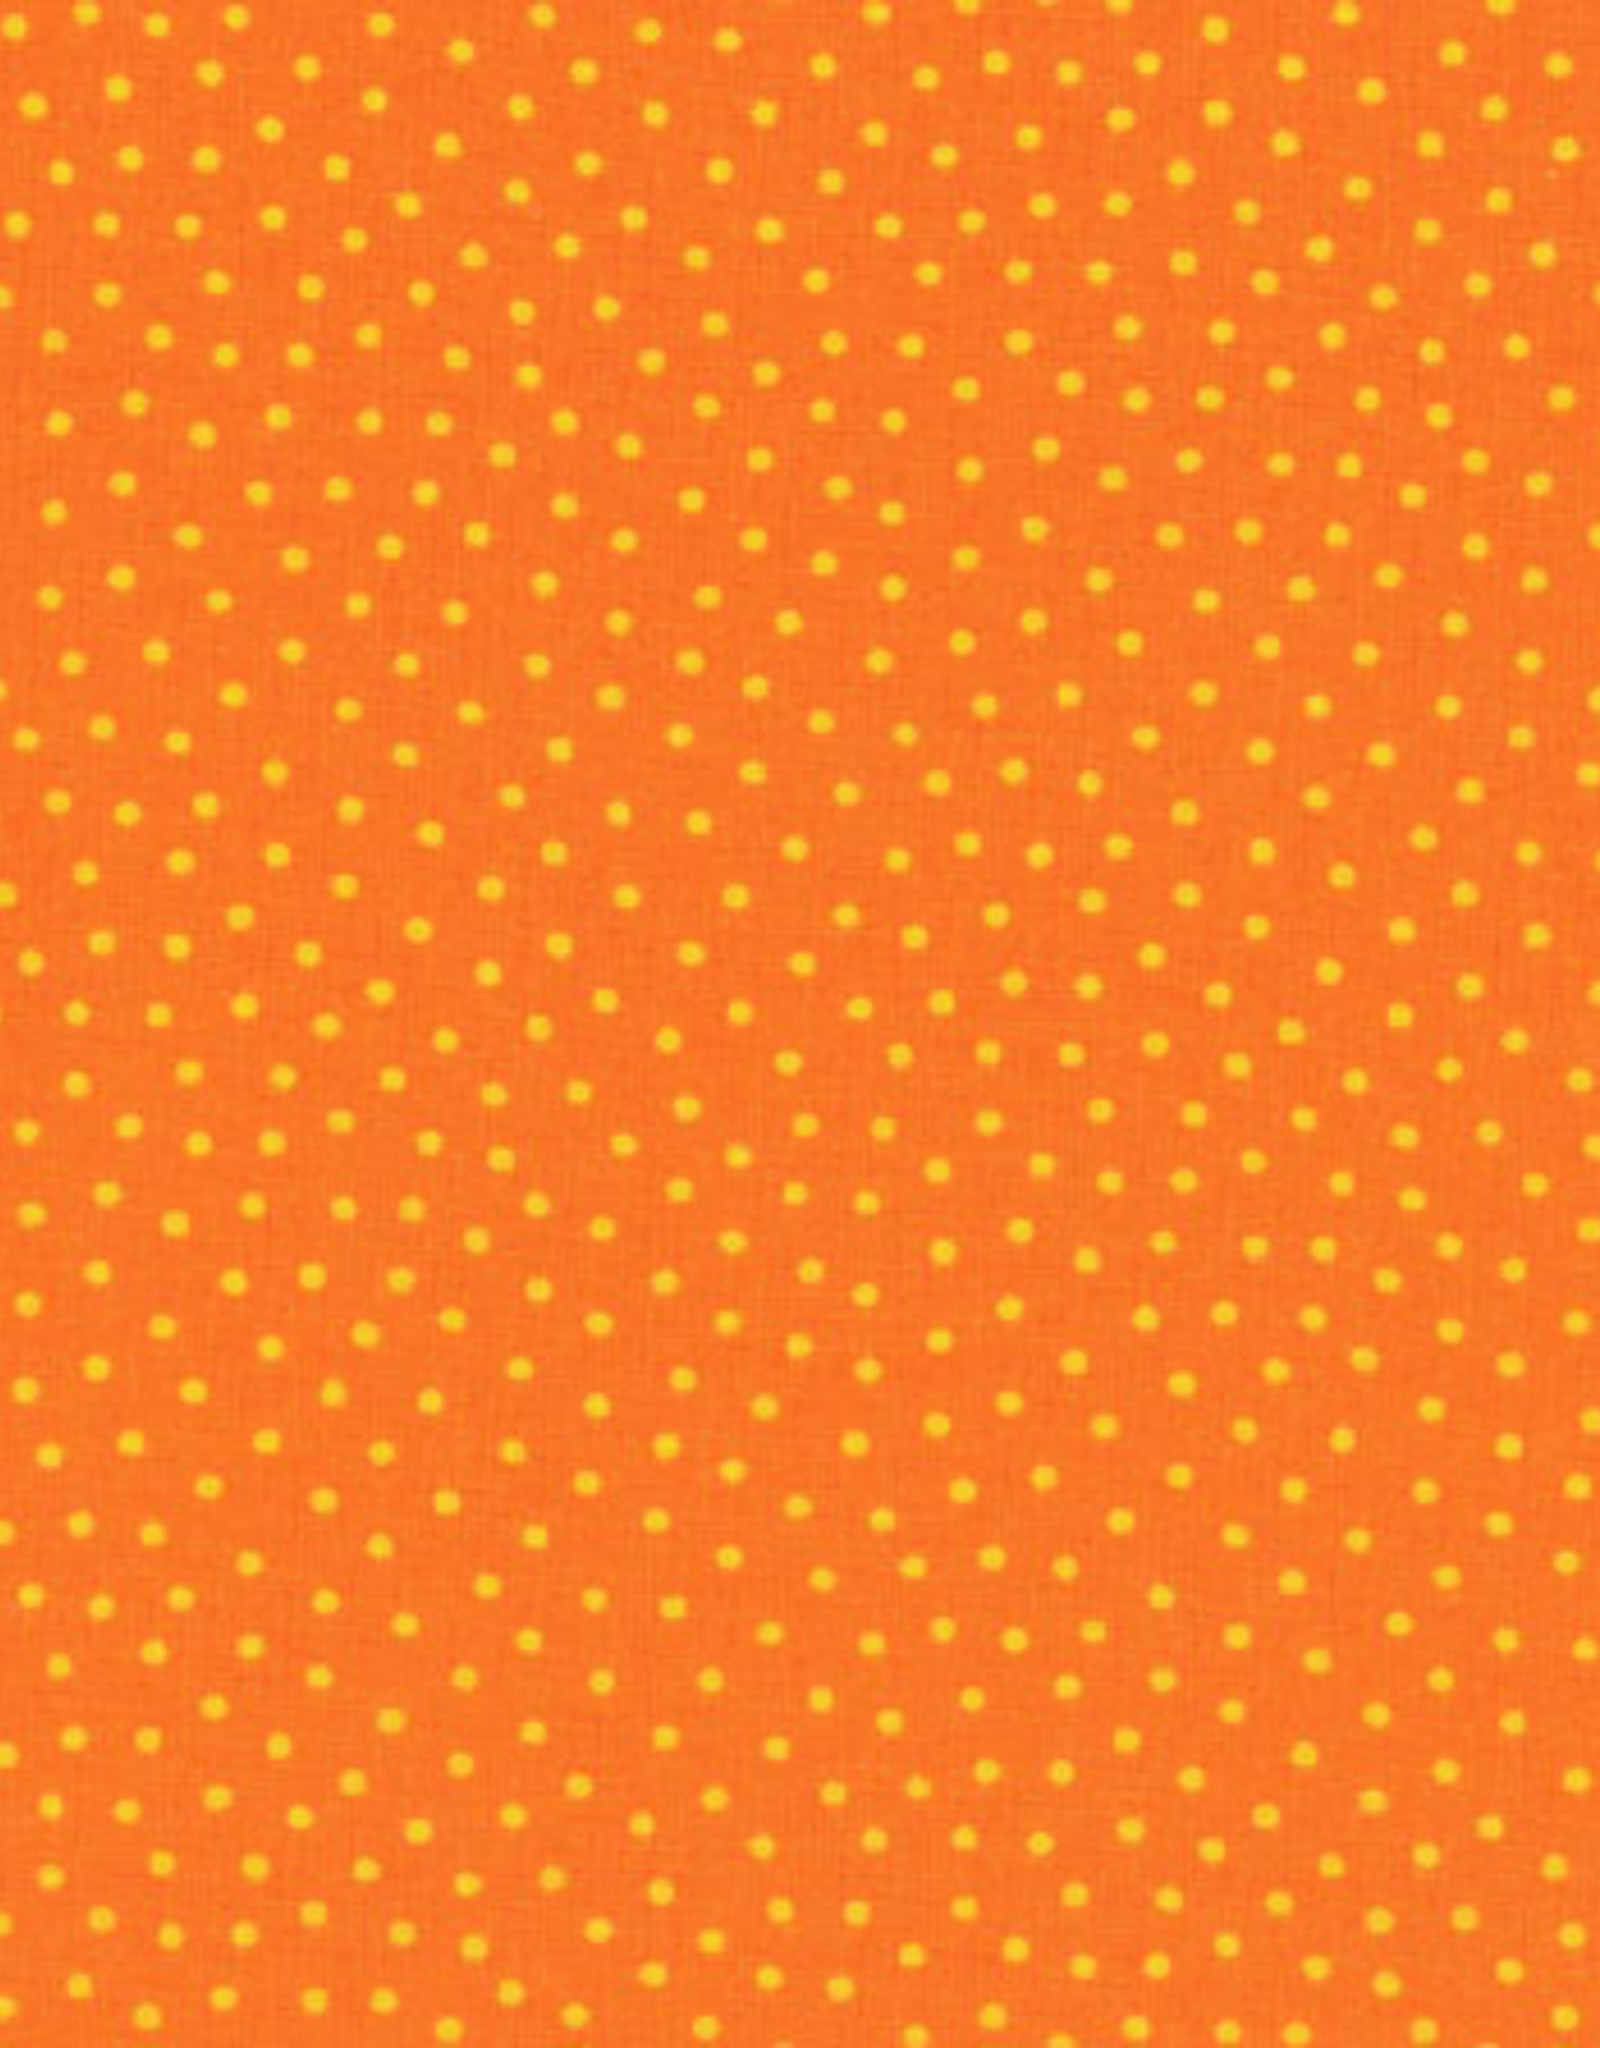 Westfalenstoffe AG 10 cm Druckstoff  010505828 orange-gelb